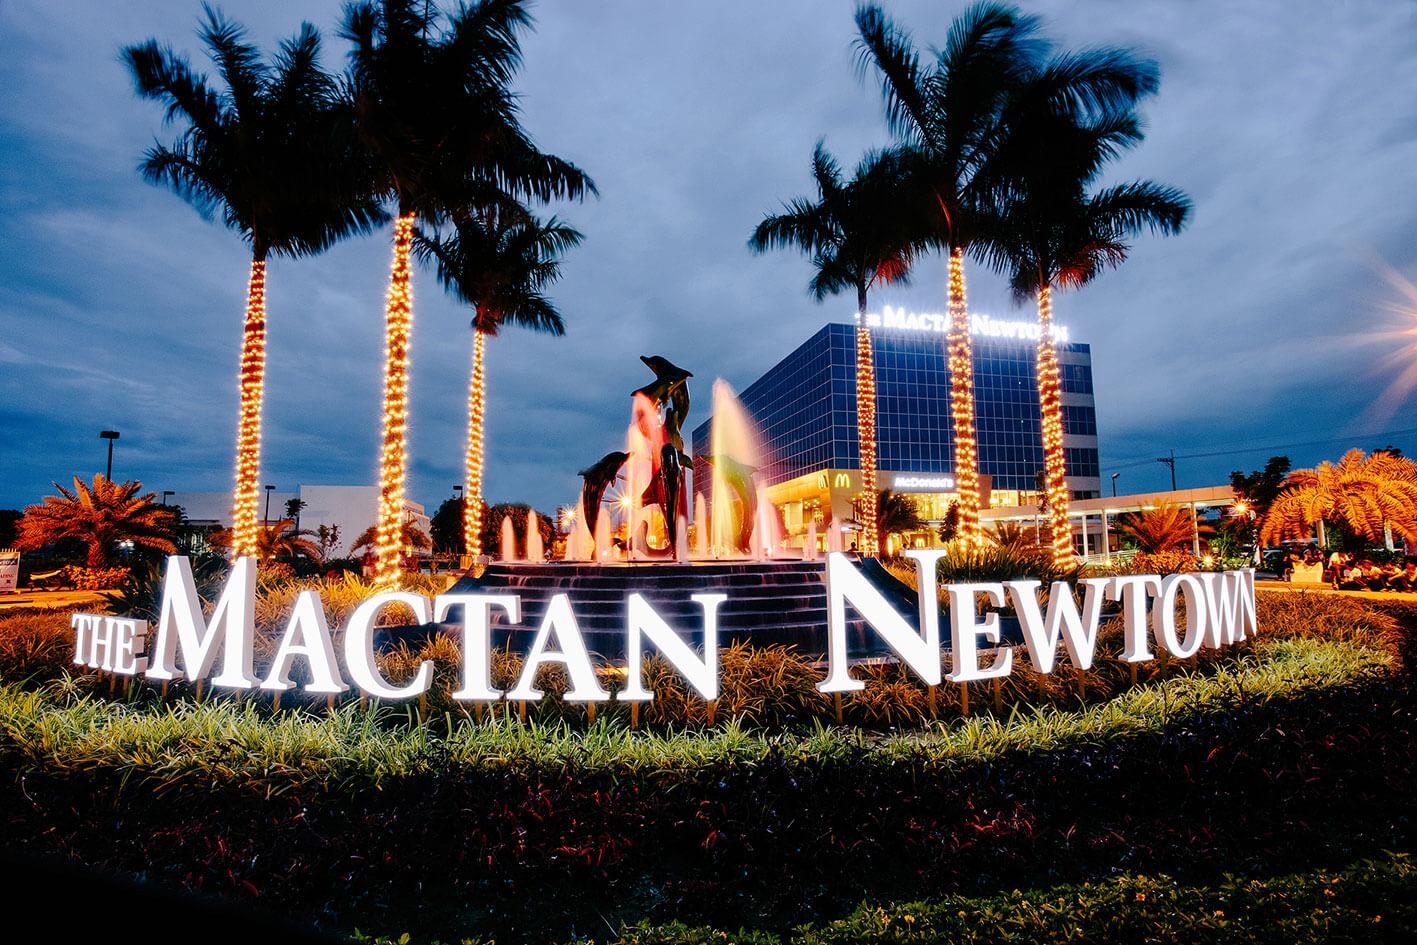 Mactan Newtown PokeStop